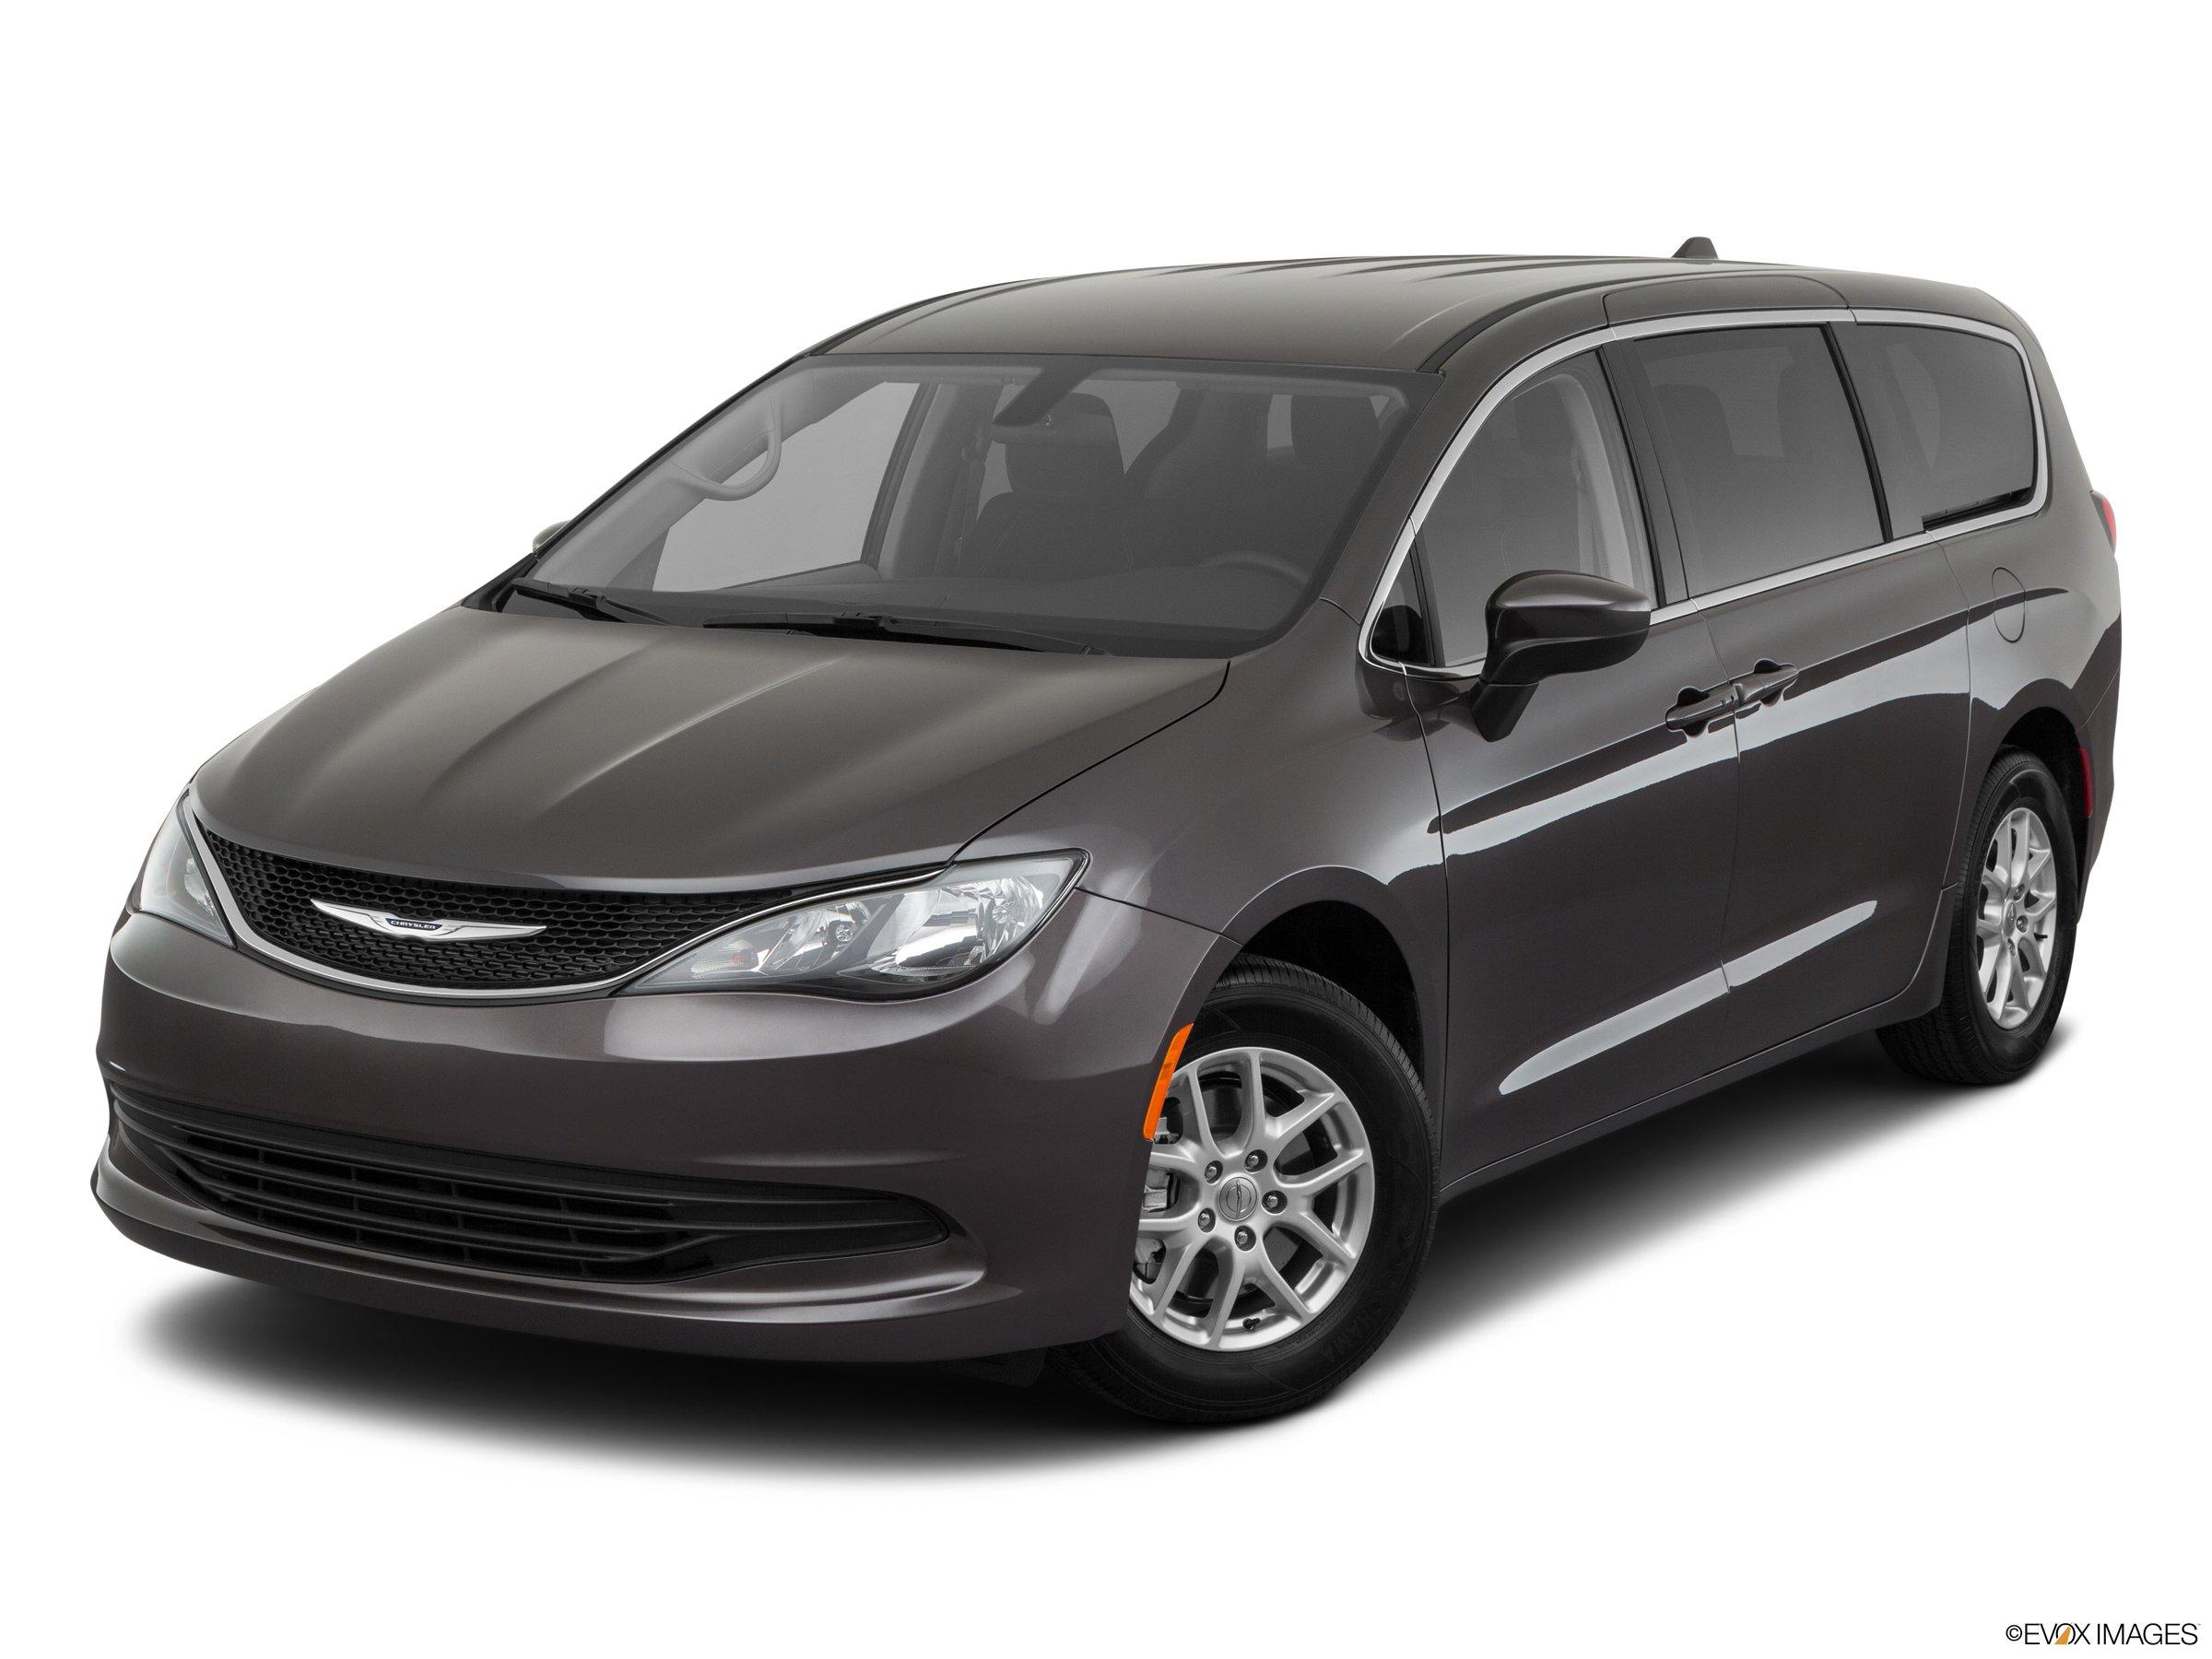 2020 Chrysler Voyager LX FWD minivan